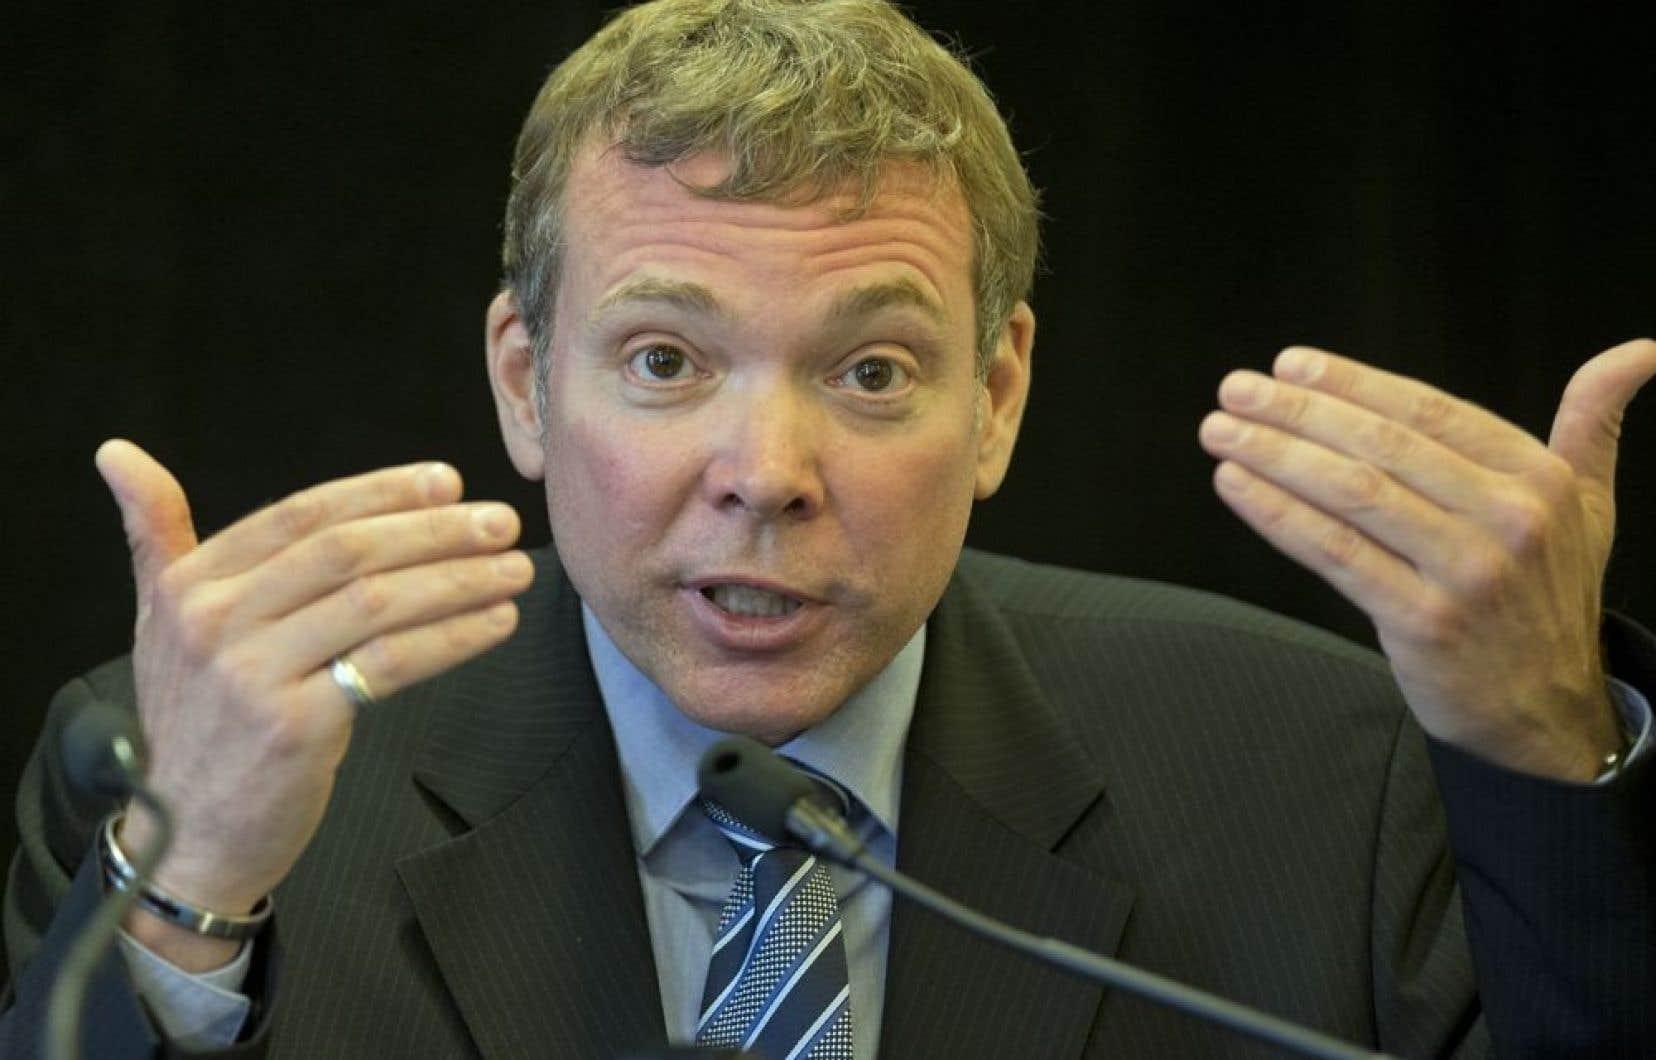 Philippe Schnobb